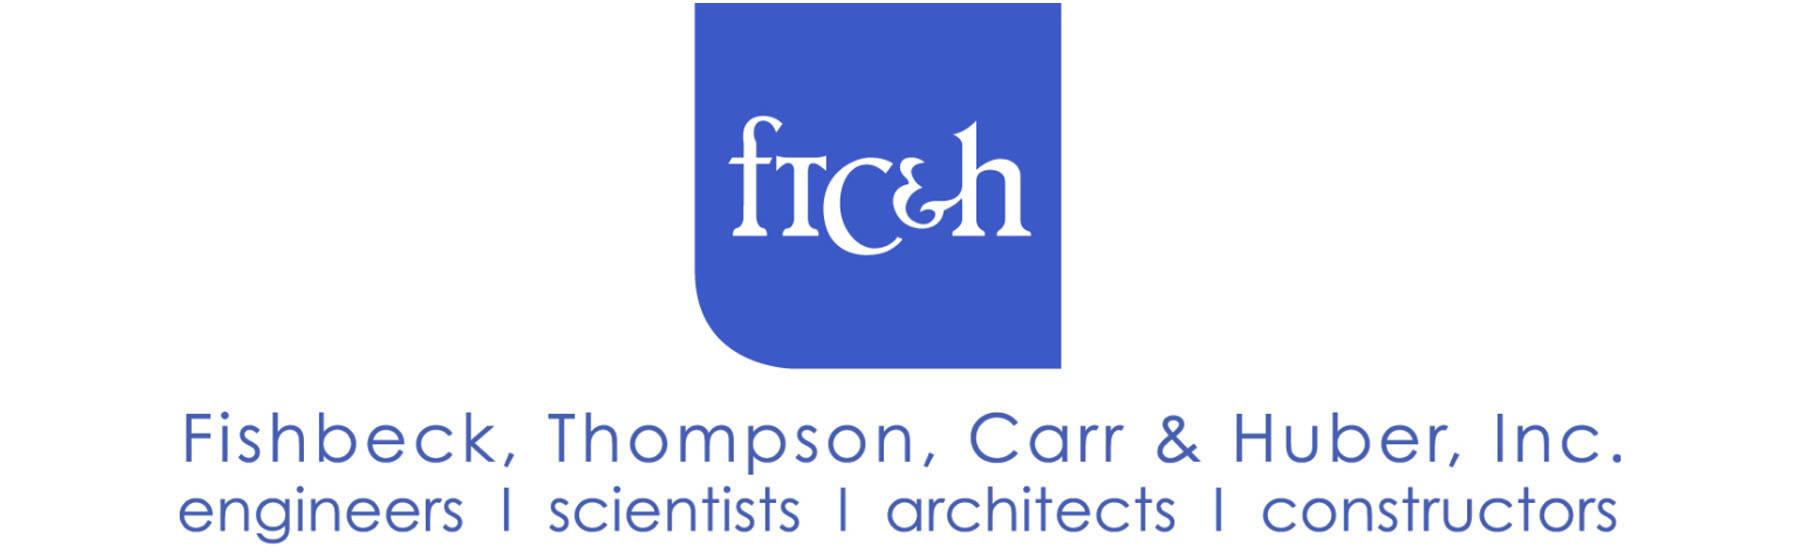 ftch_2103_logo.jpg